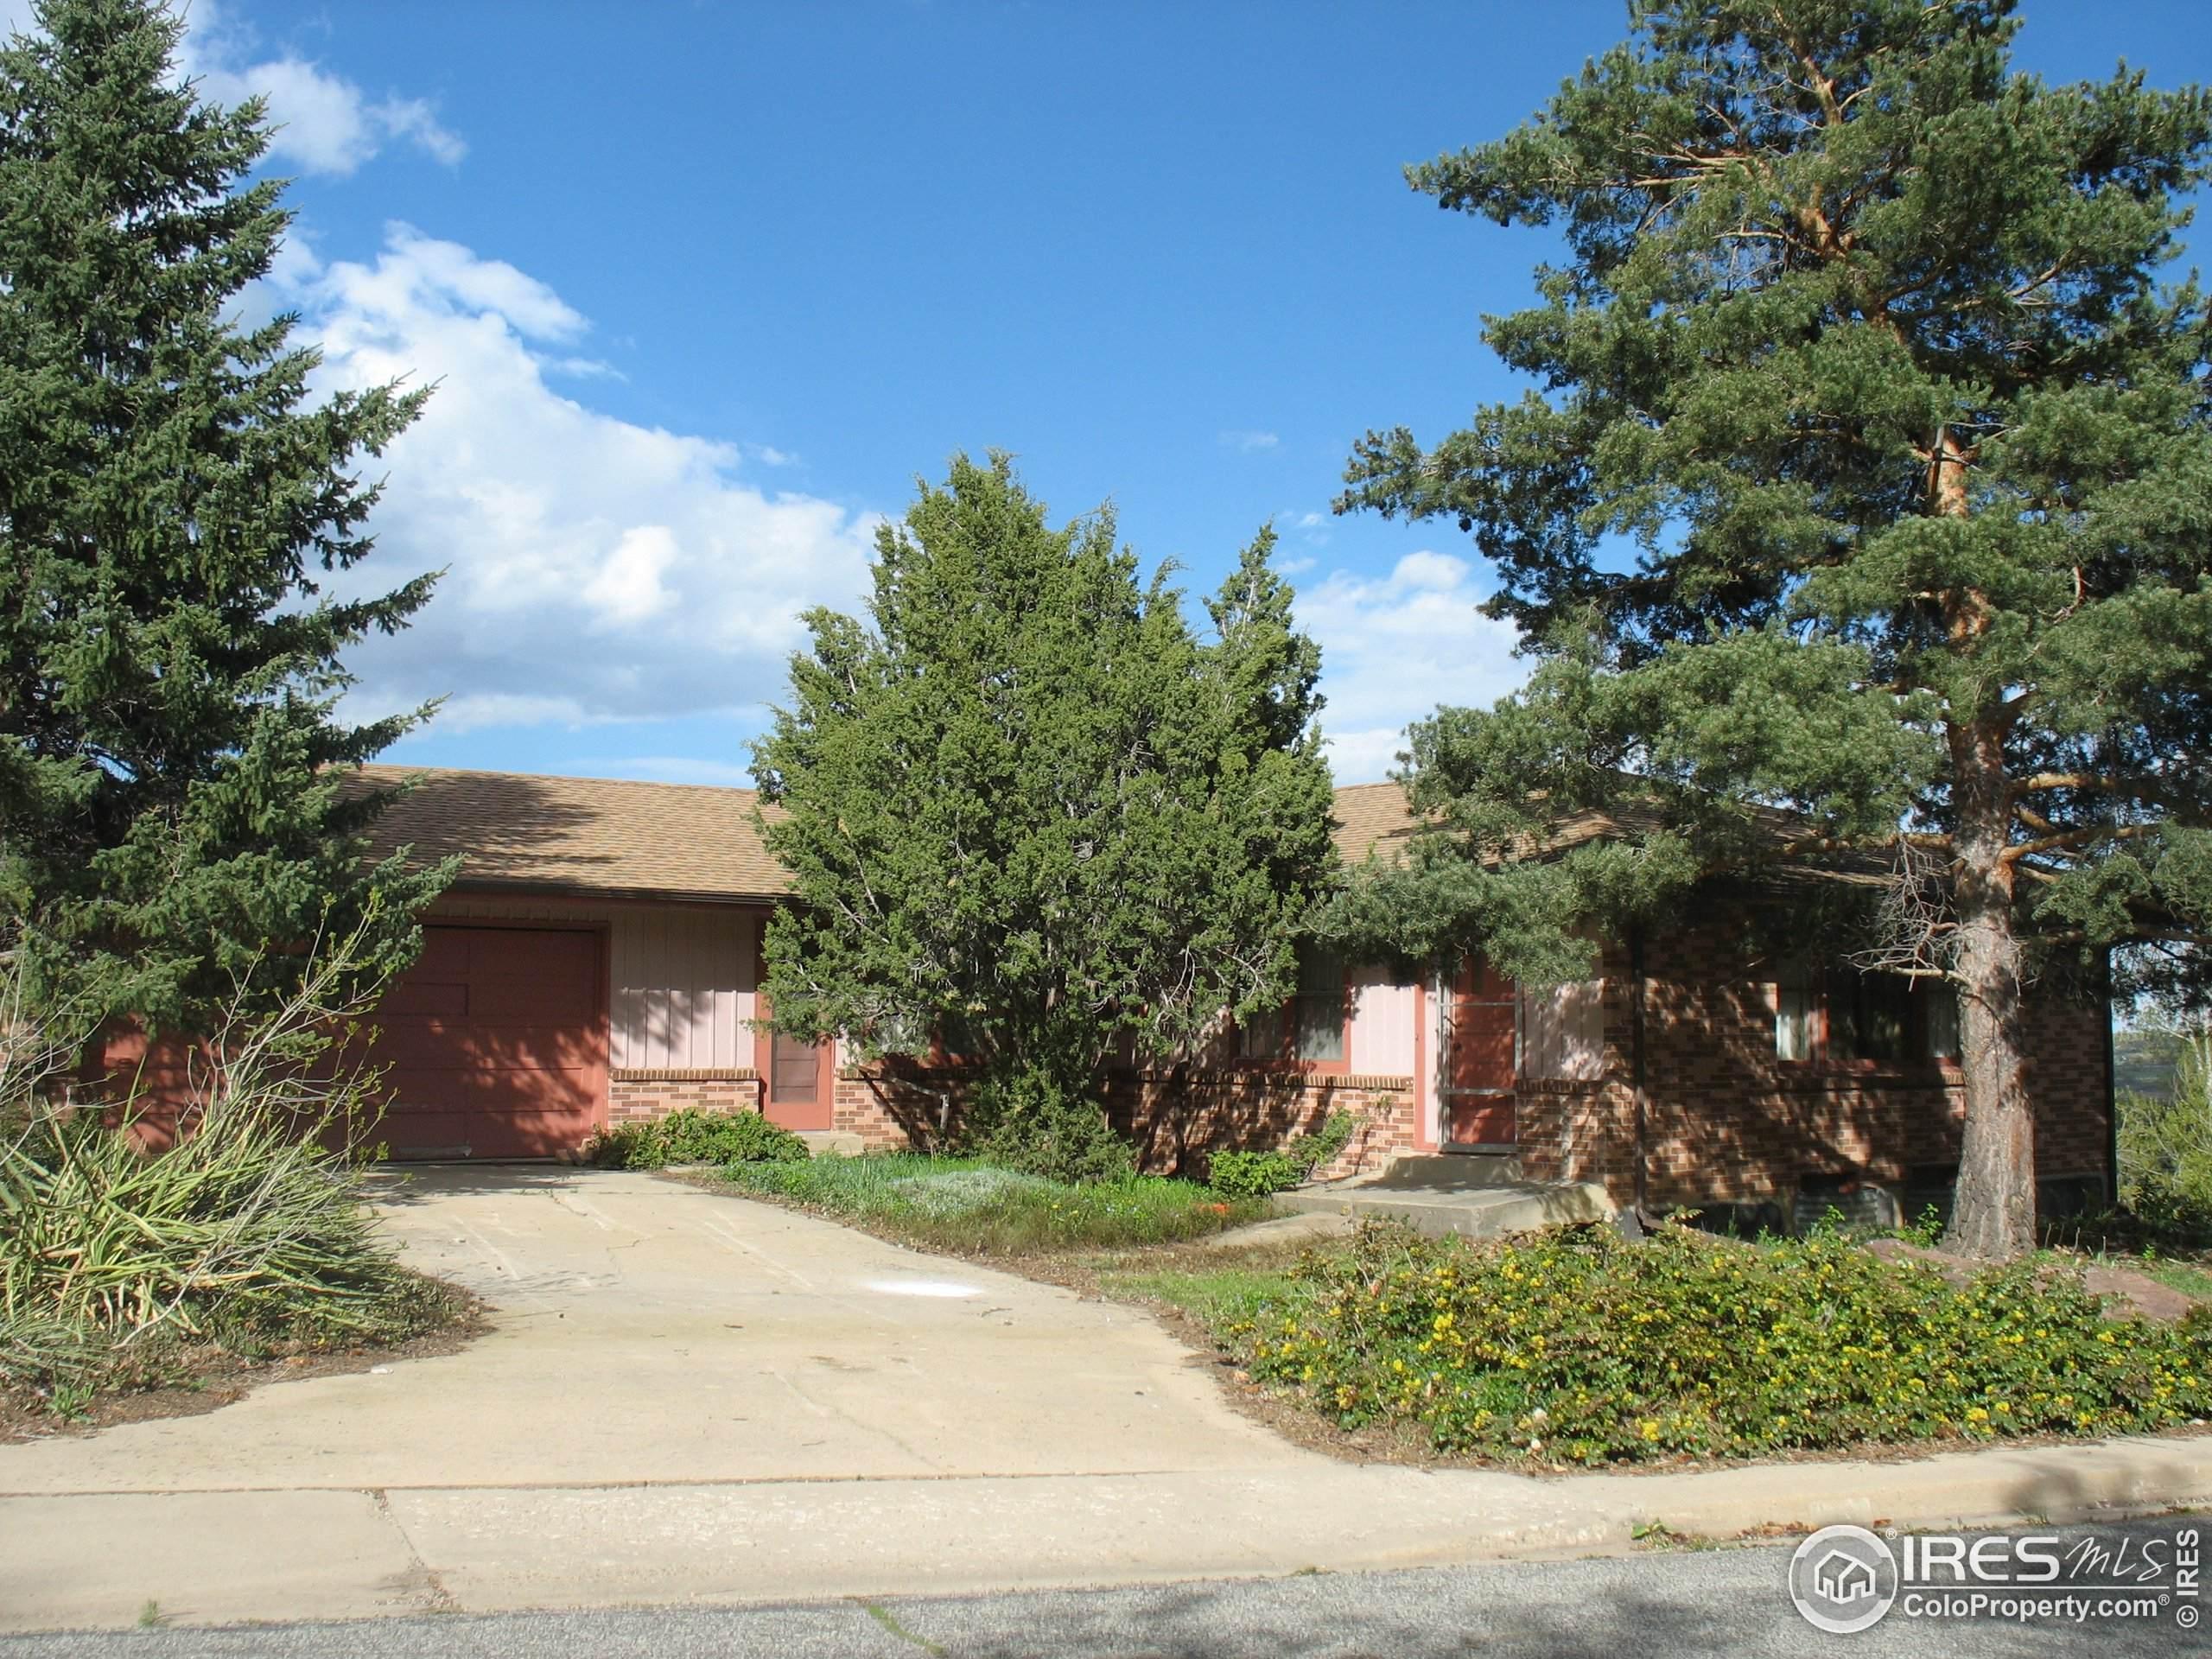 6714 Rose Creek Way #4, Fort Collins, CO 80525 (MLS #928472) :: Hub Real Estate